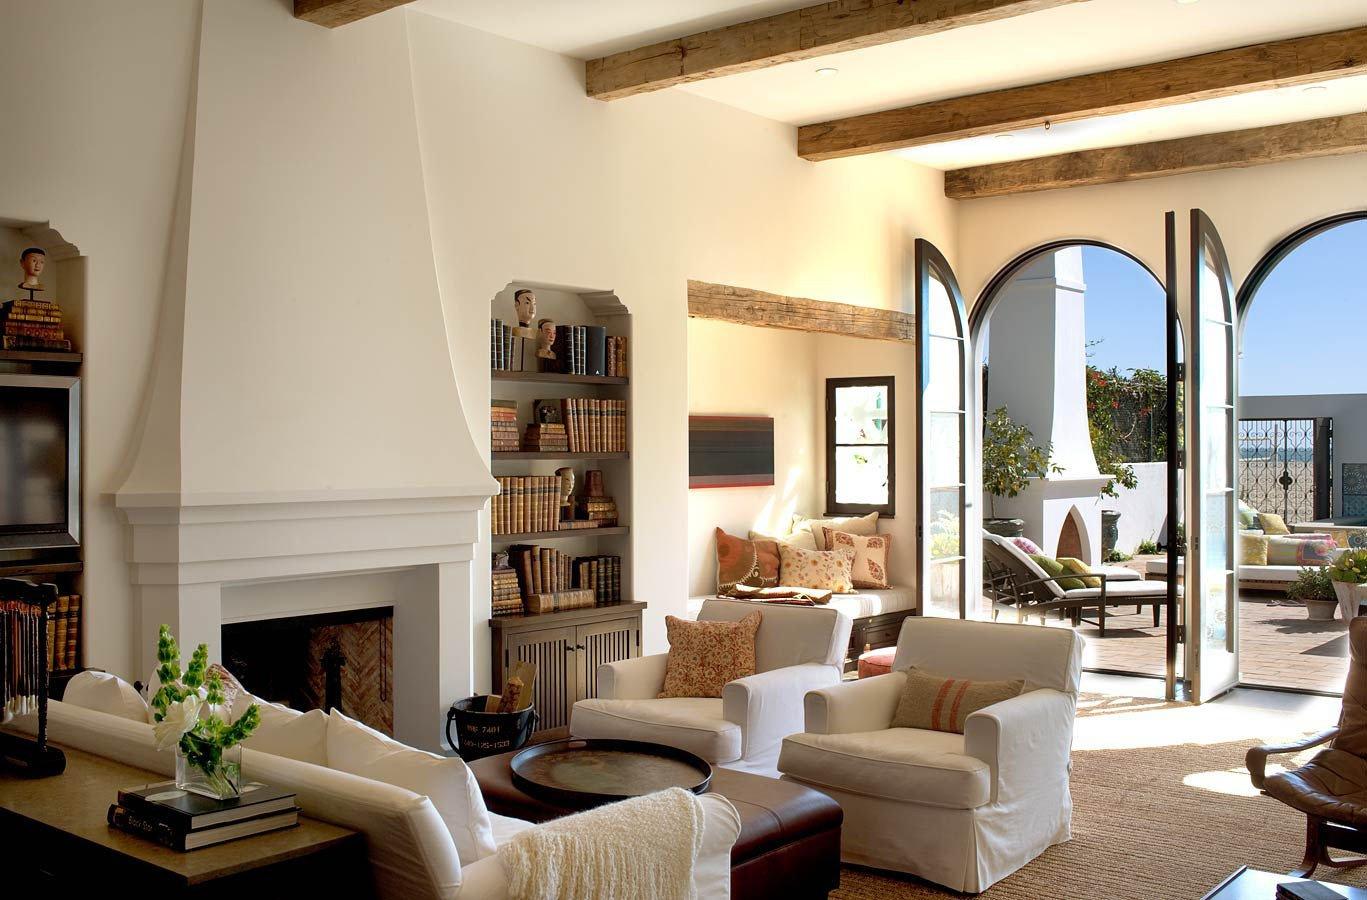 Spanish Style Home Decor Interior Luxury Spanish Colonial Beach House In Santa Monica Idesignarch